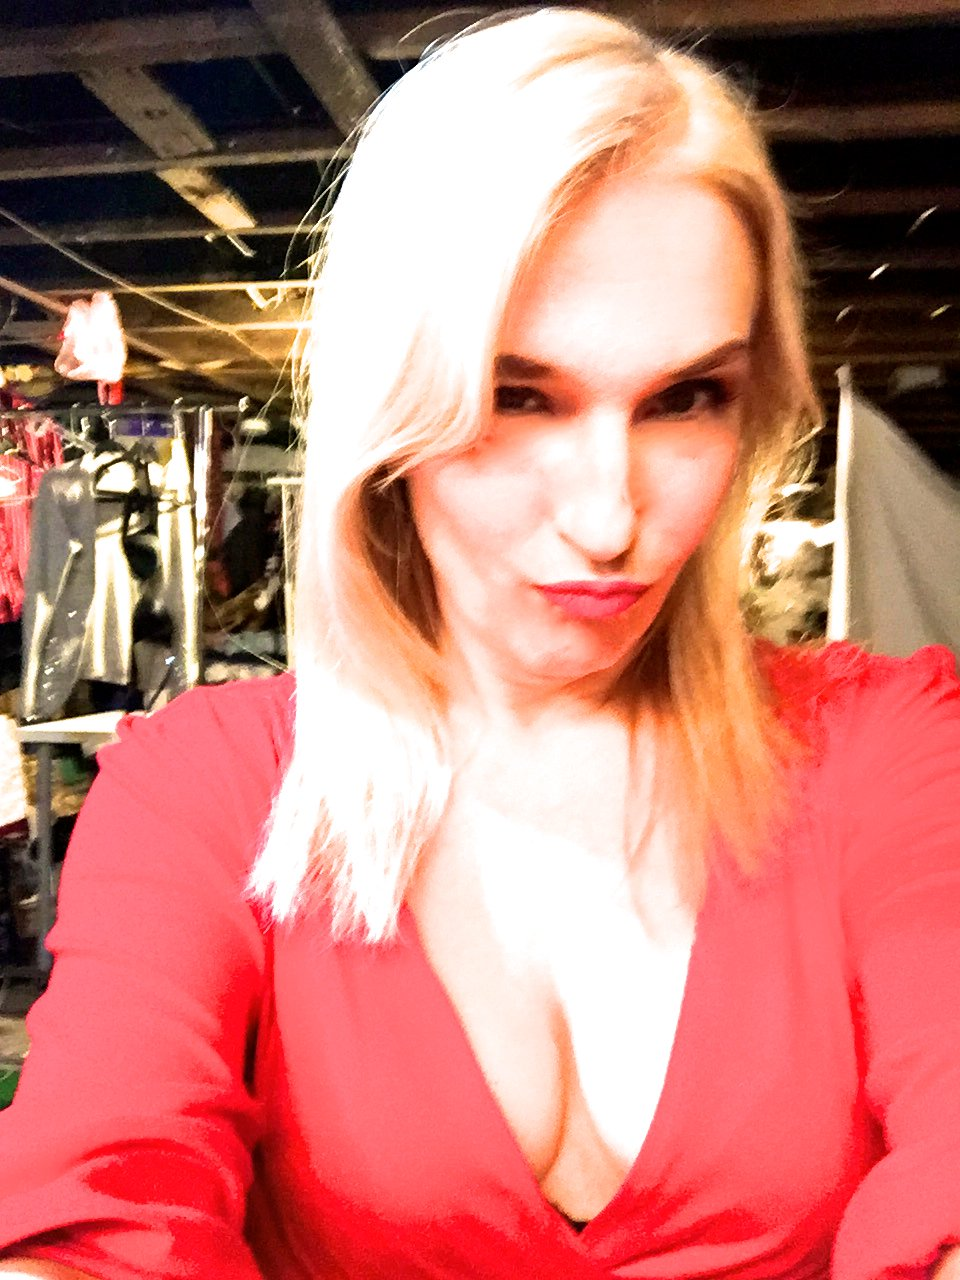 Cleavage Anne-Marie nude (27 photos), Tits, Fappening, Selfie, braless 2019